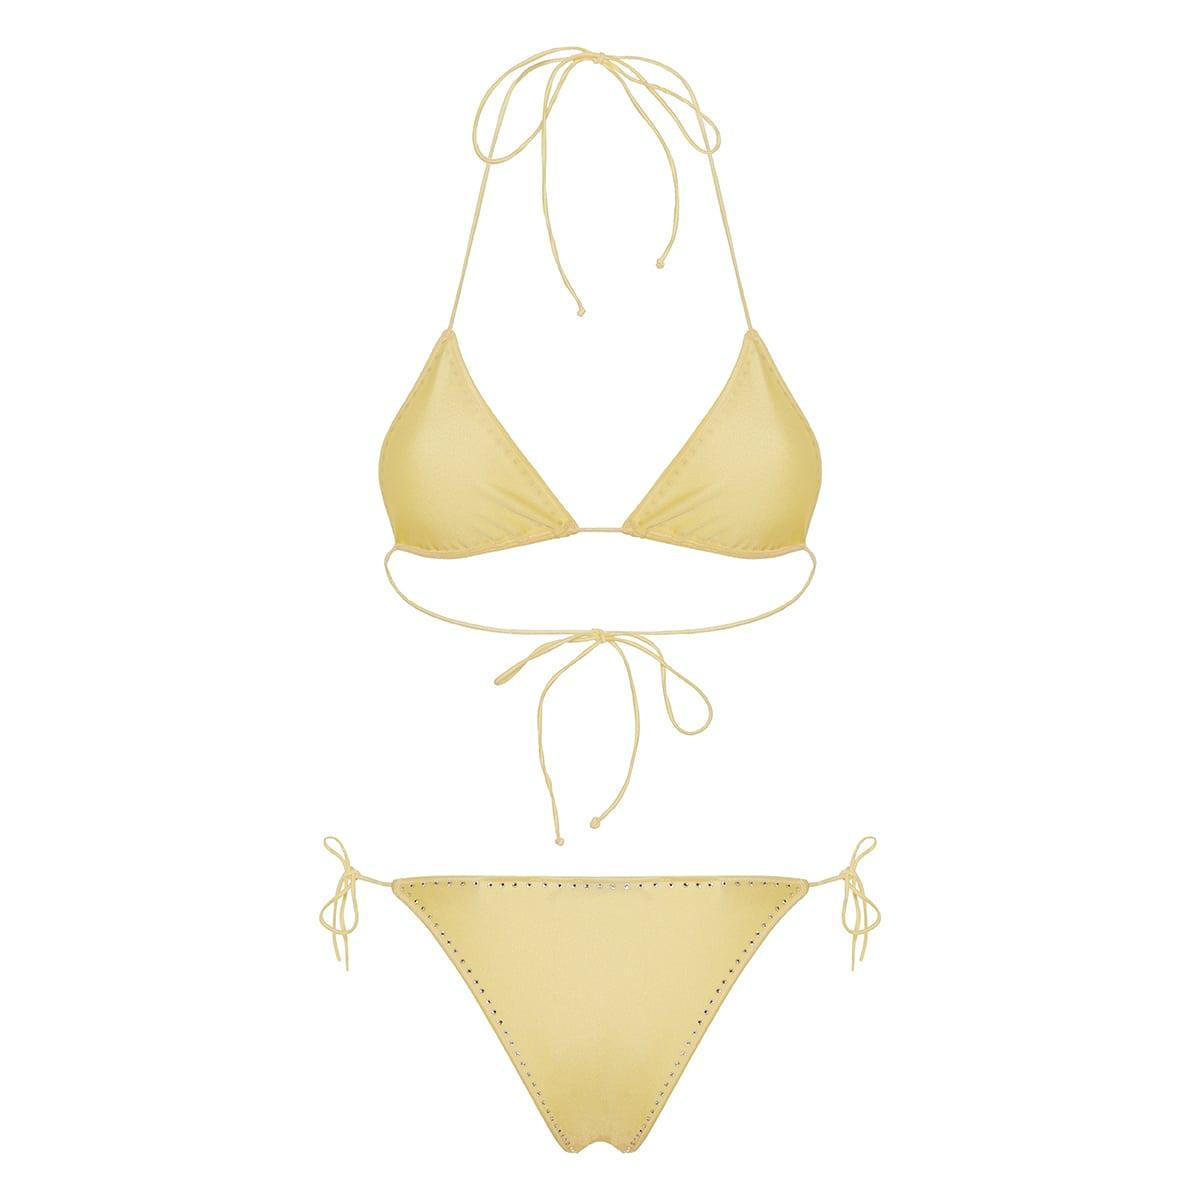 Crystal-embellished triangle bikini